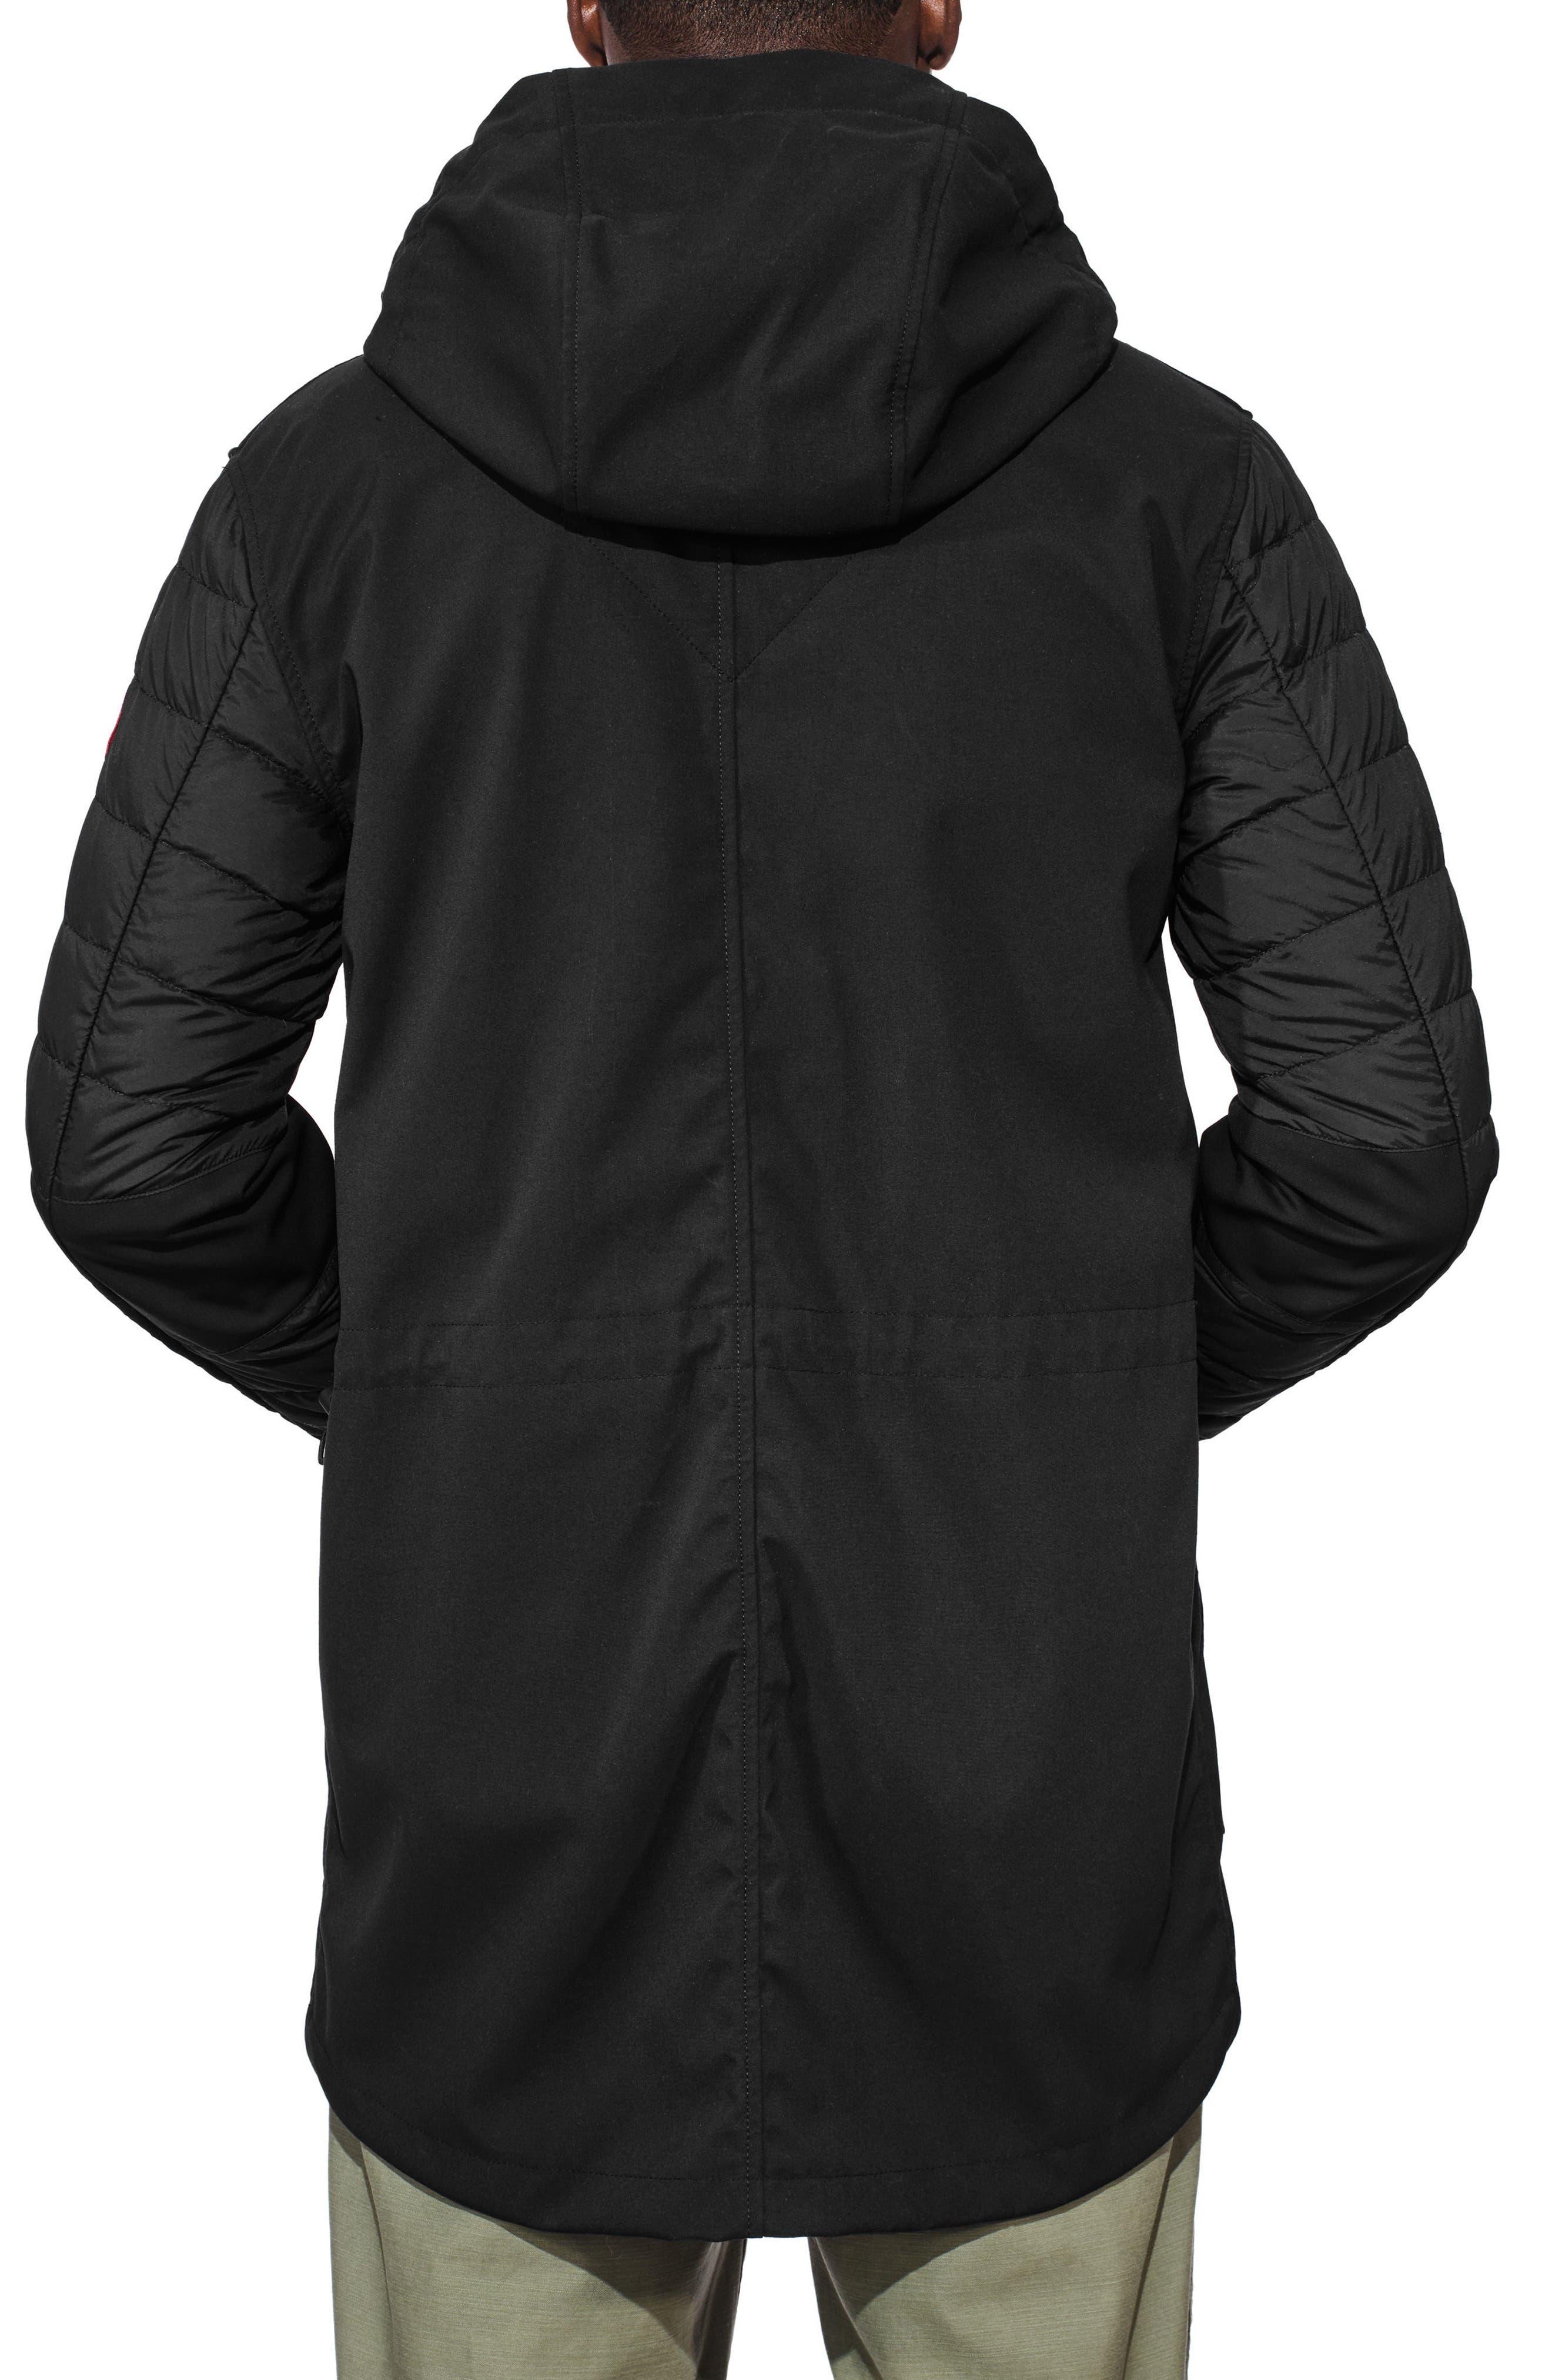 Selwyn Down Filled Coat,                             Alternate thumbnail 2, color,                             BLACK/ BLACK